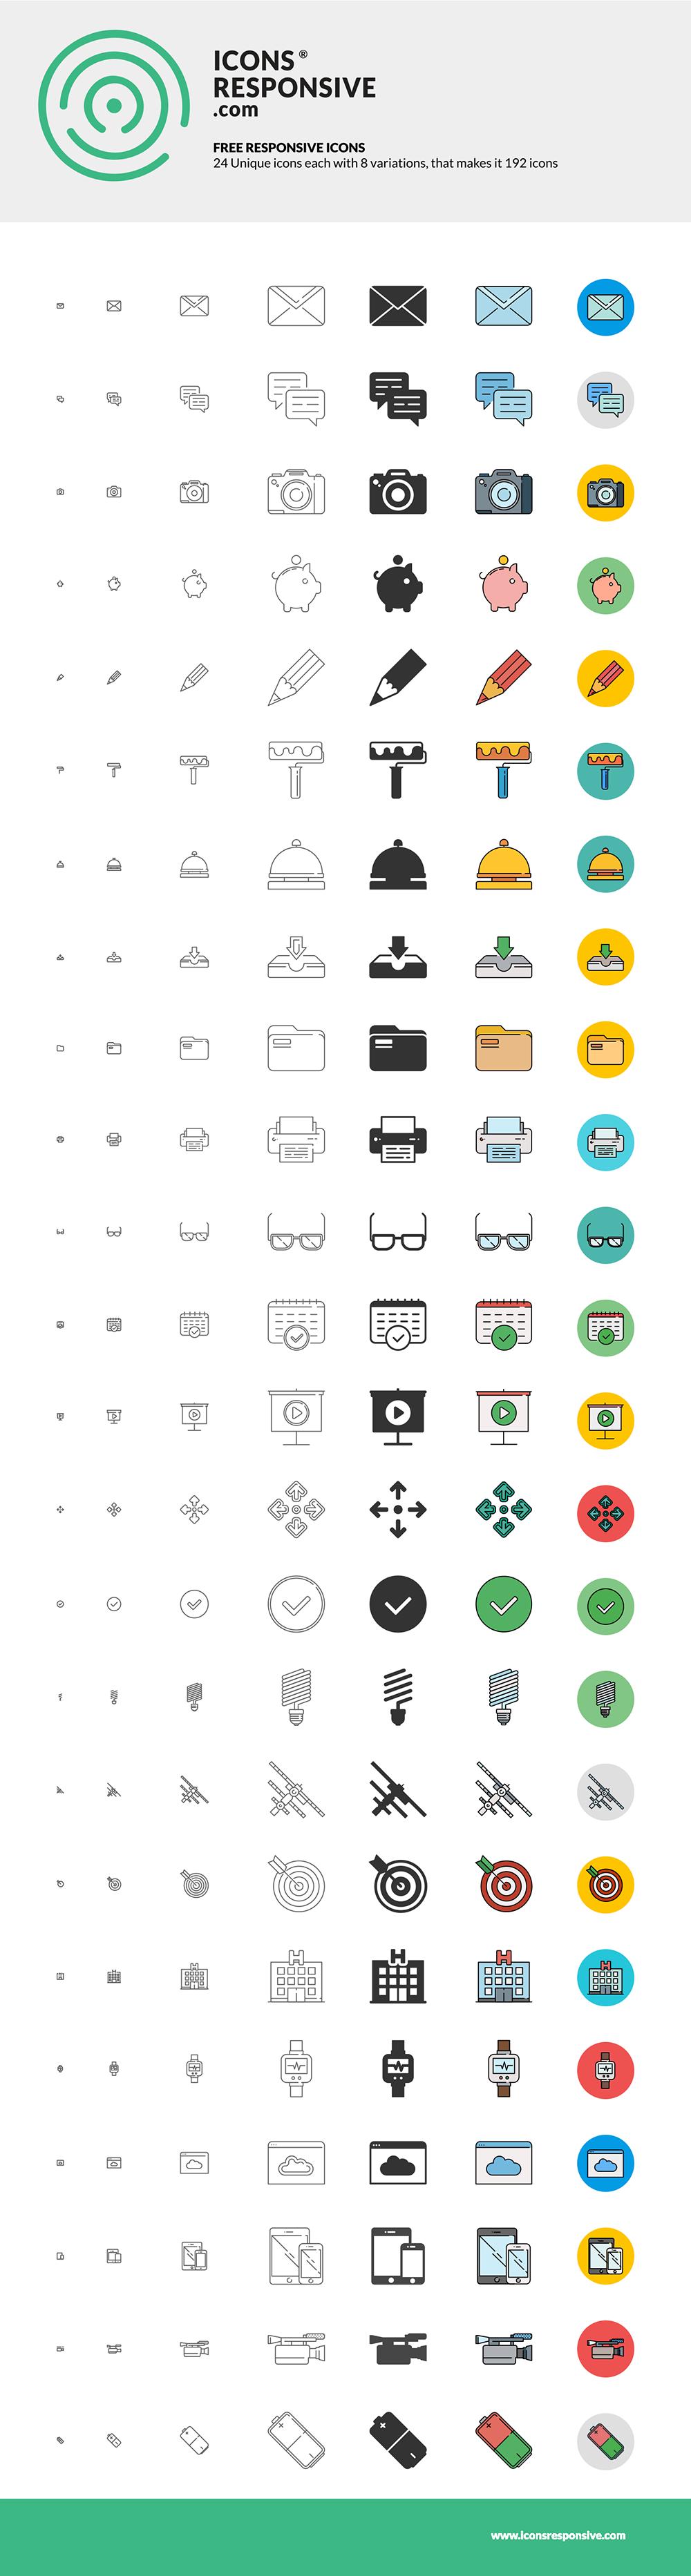 Dribble-icons-responsive-free-set